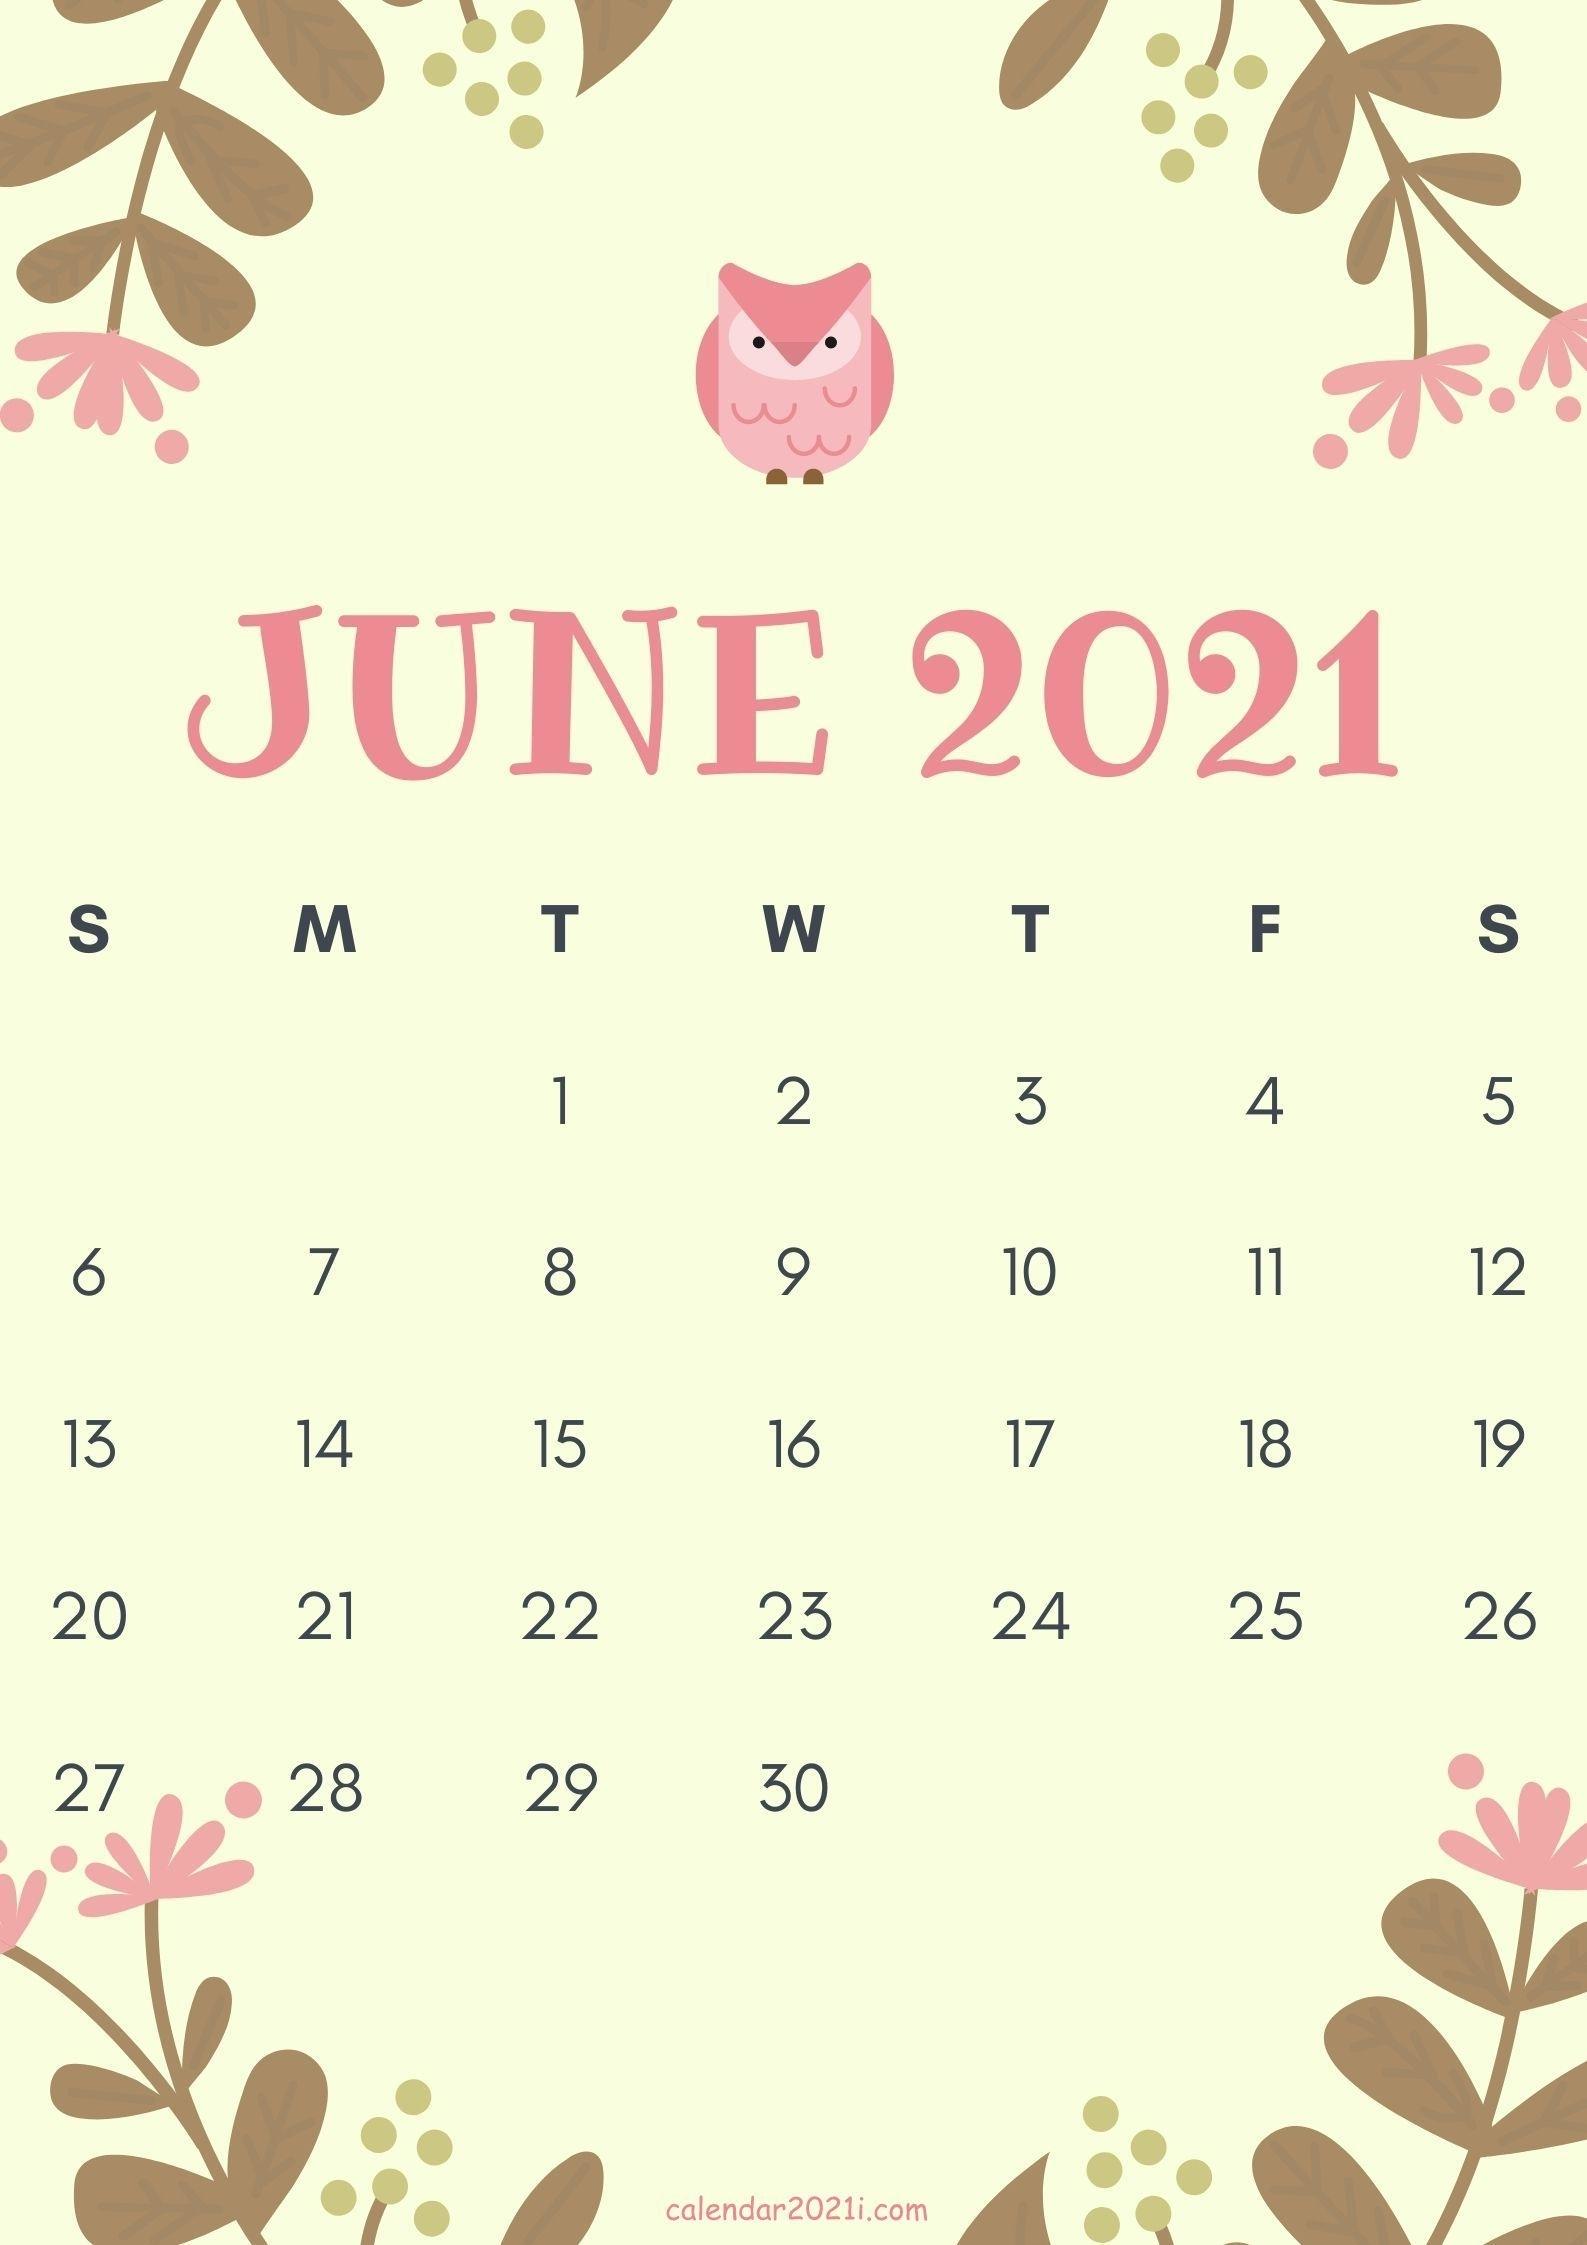 Cute June 2021 Calendar Design Theme Layout Free Download In